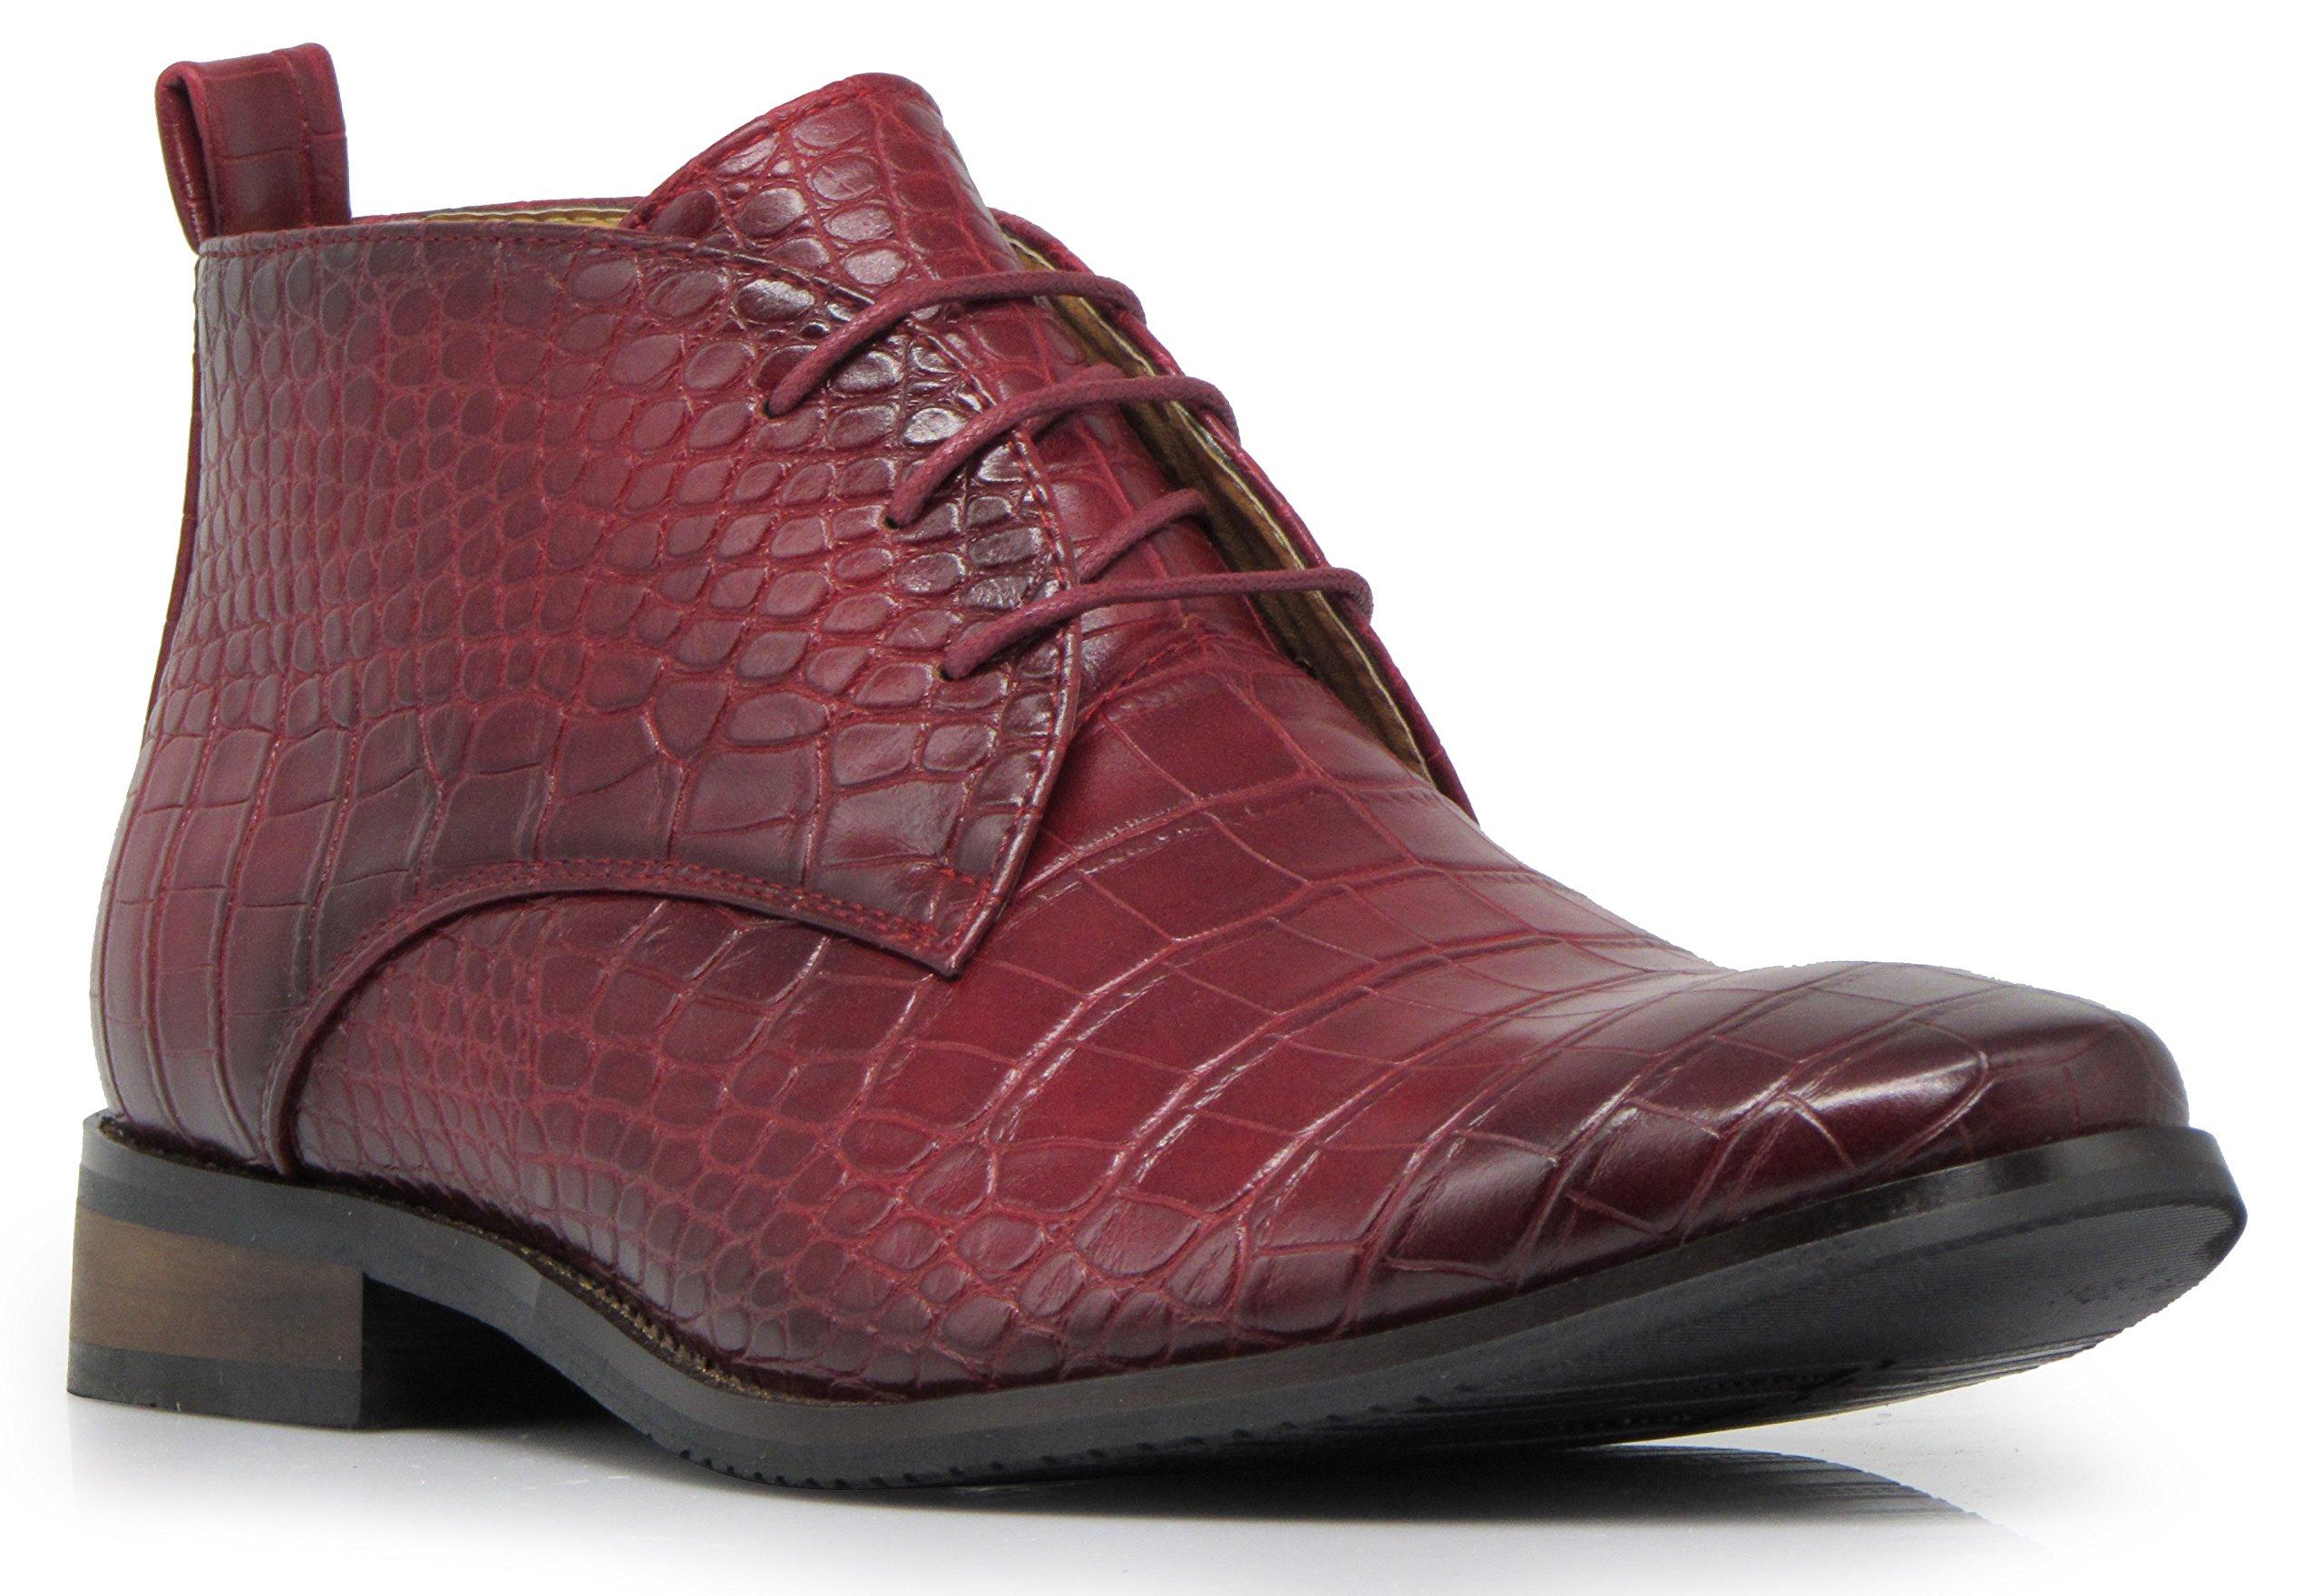 Enzo Romeo DF2 Men's Dress Boots Alligator Crocodile Print Chelsea Chukka Ankle Lace up Fashion Short Boots (9.5 D(M) US, Burgundy)